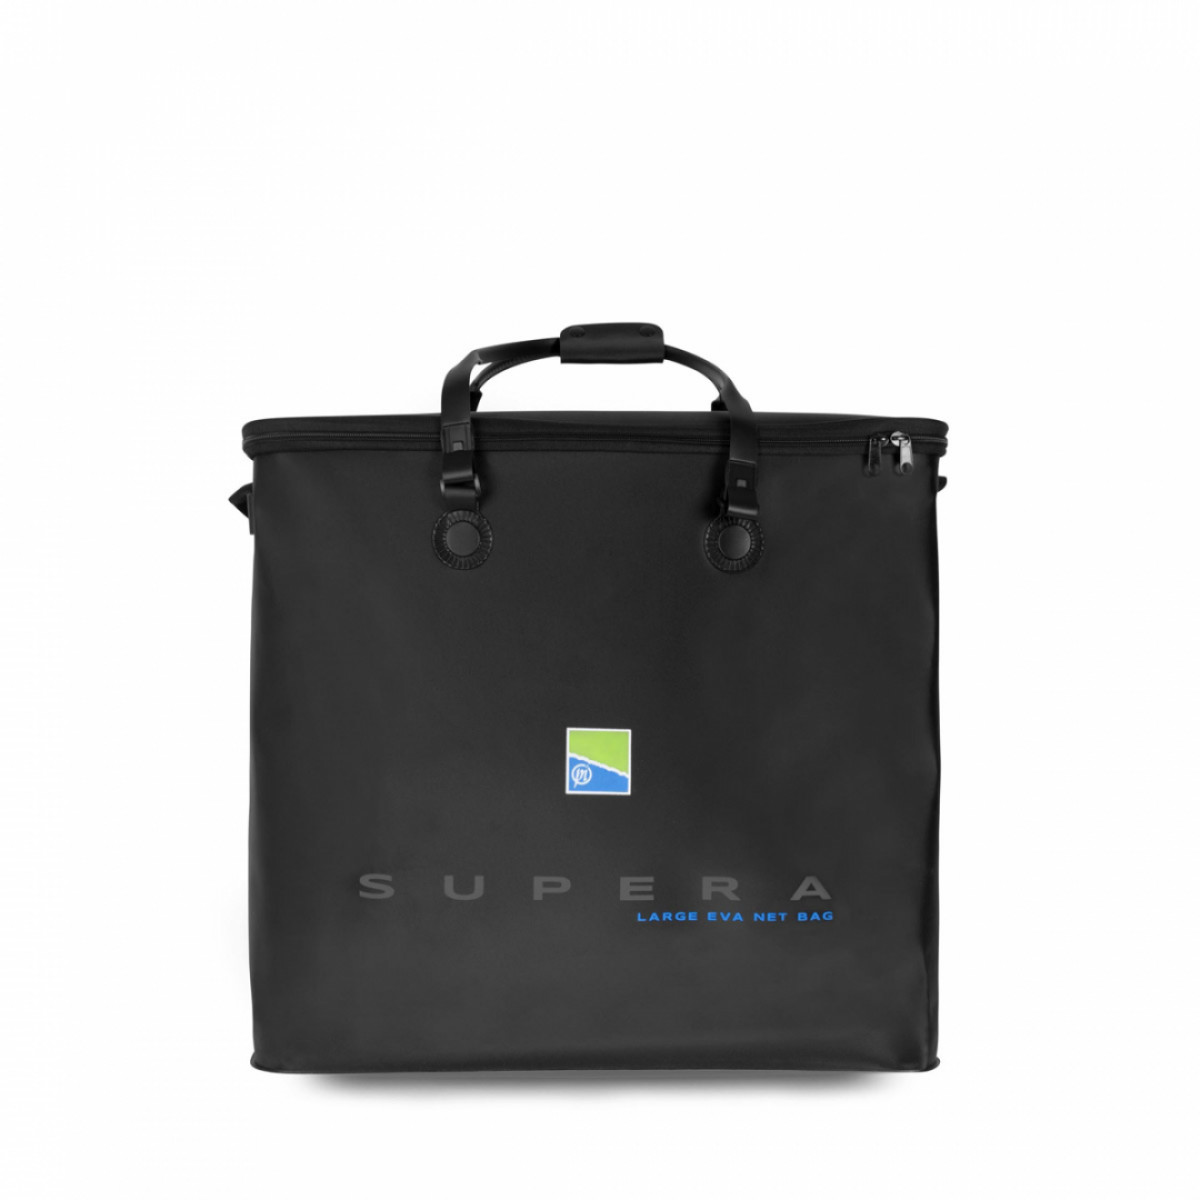 Supera Large Eva Net Bag